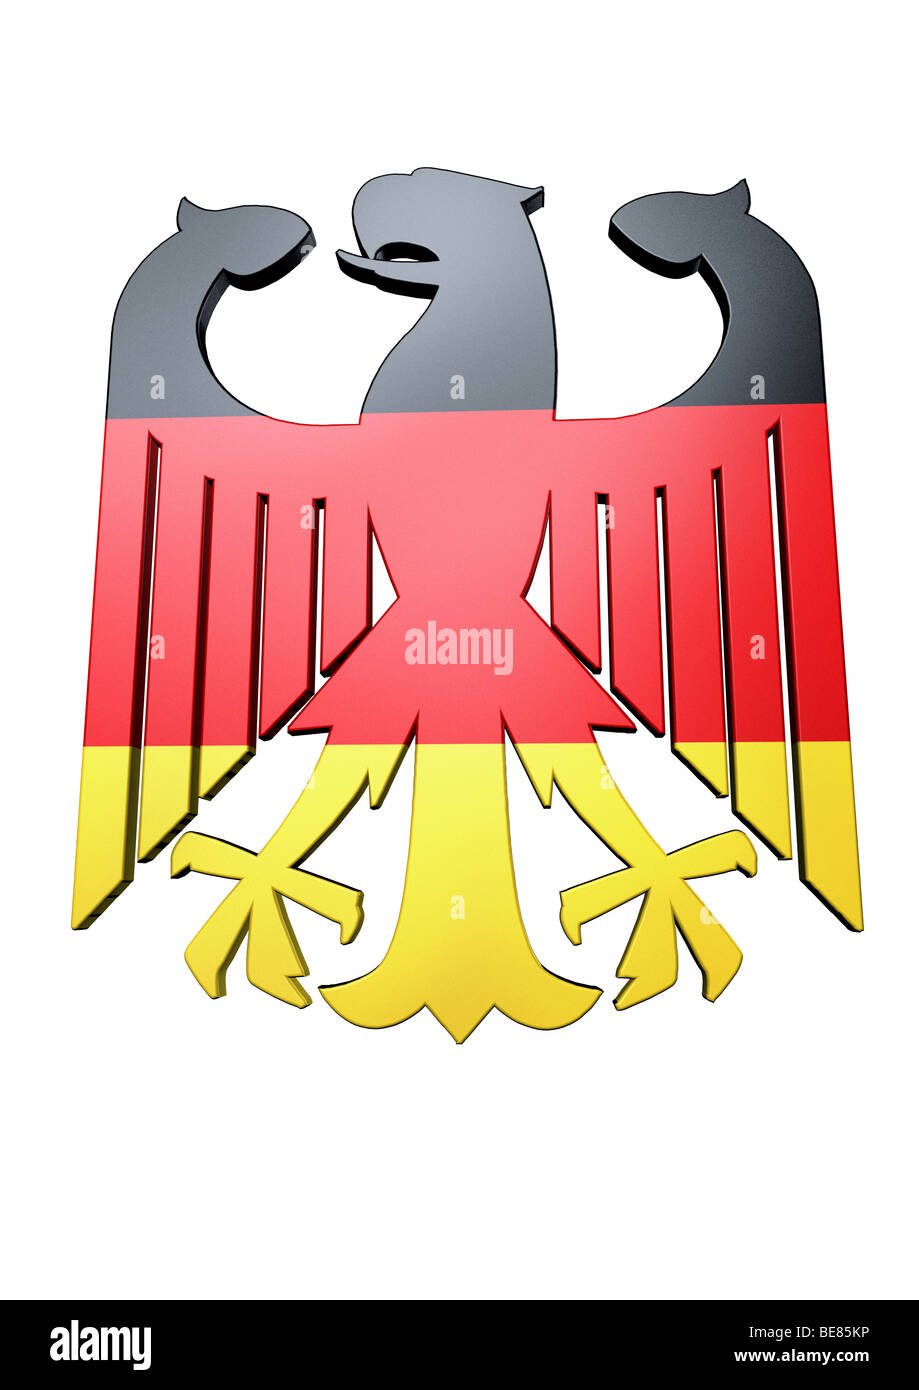 adler der bundesrepublik deutschland mit den farben der. Black Bedroom Furniture Sets. Home Design Ideas